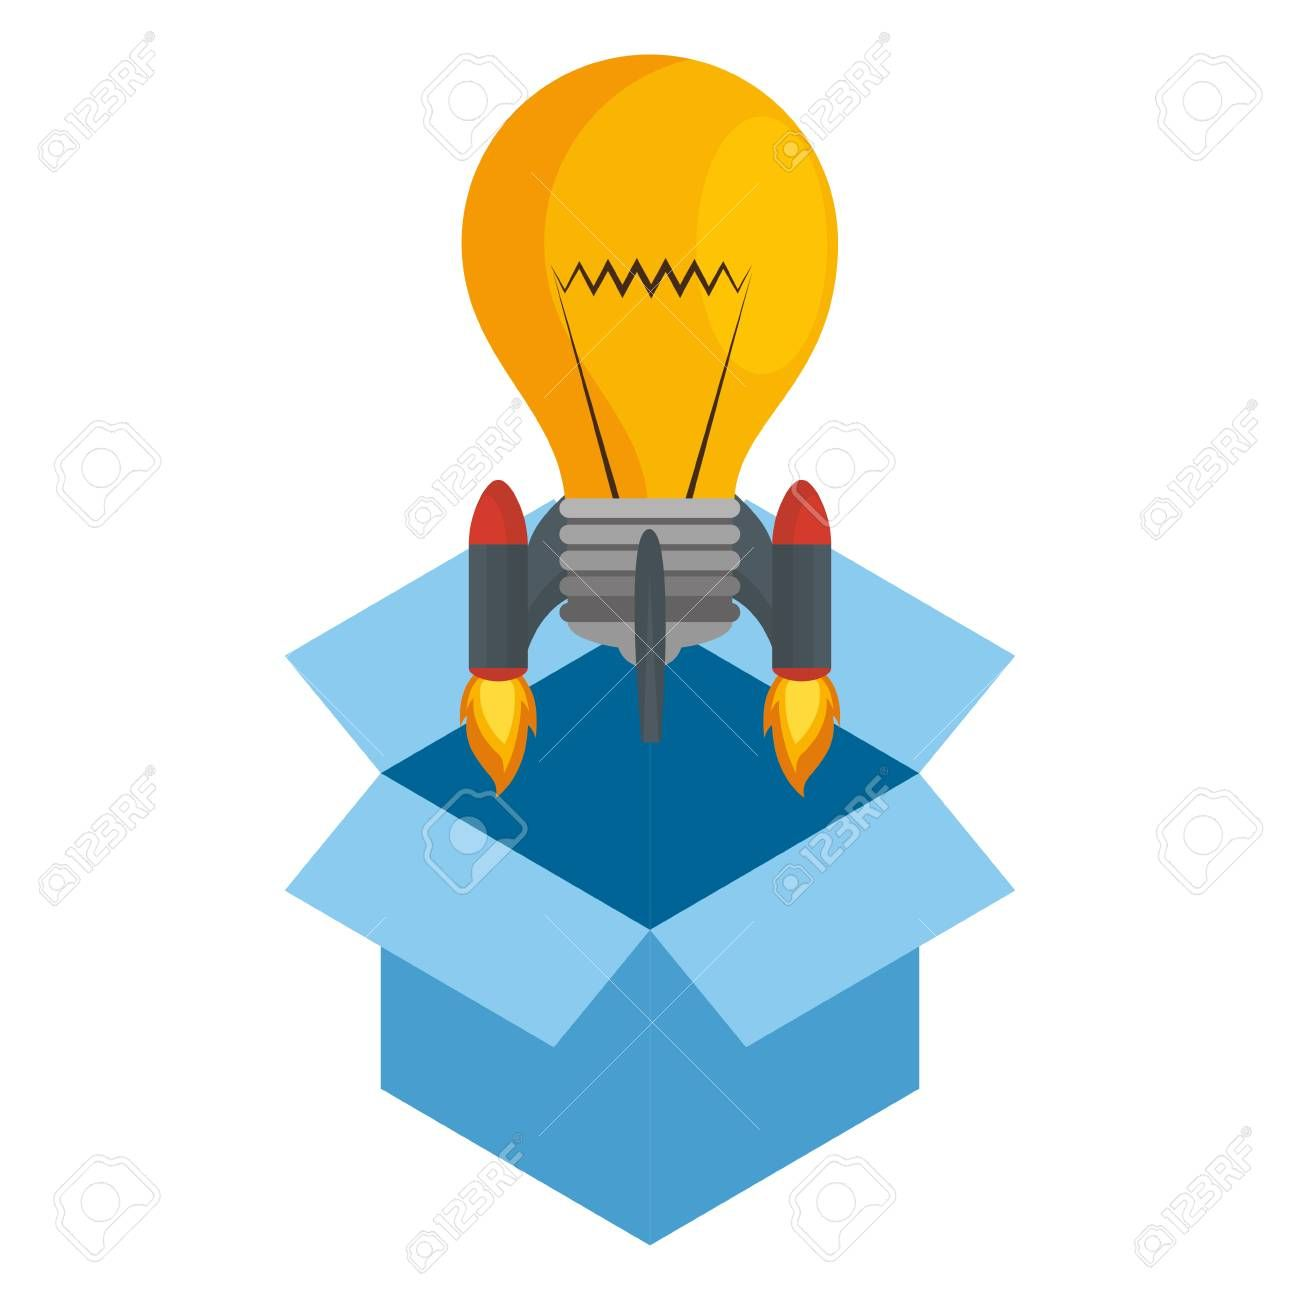 Bulb Rocket Launcher In Box Vector Illustration Design